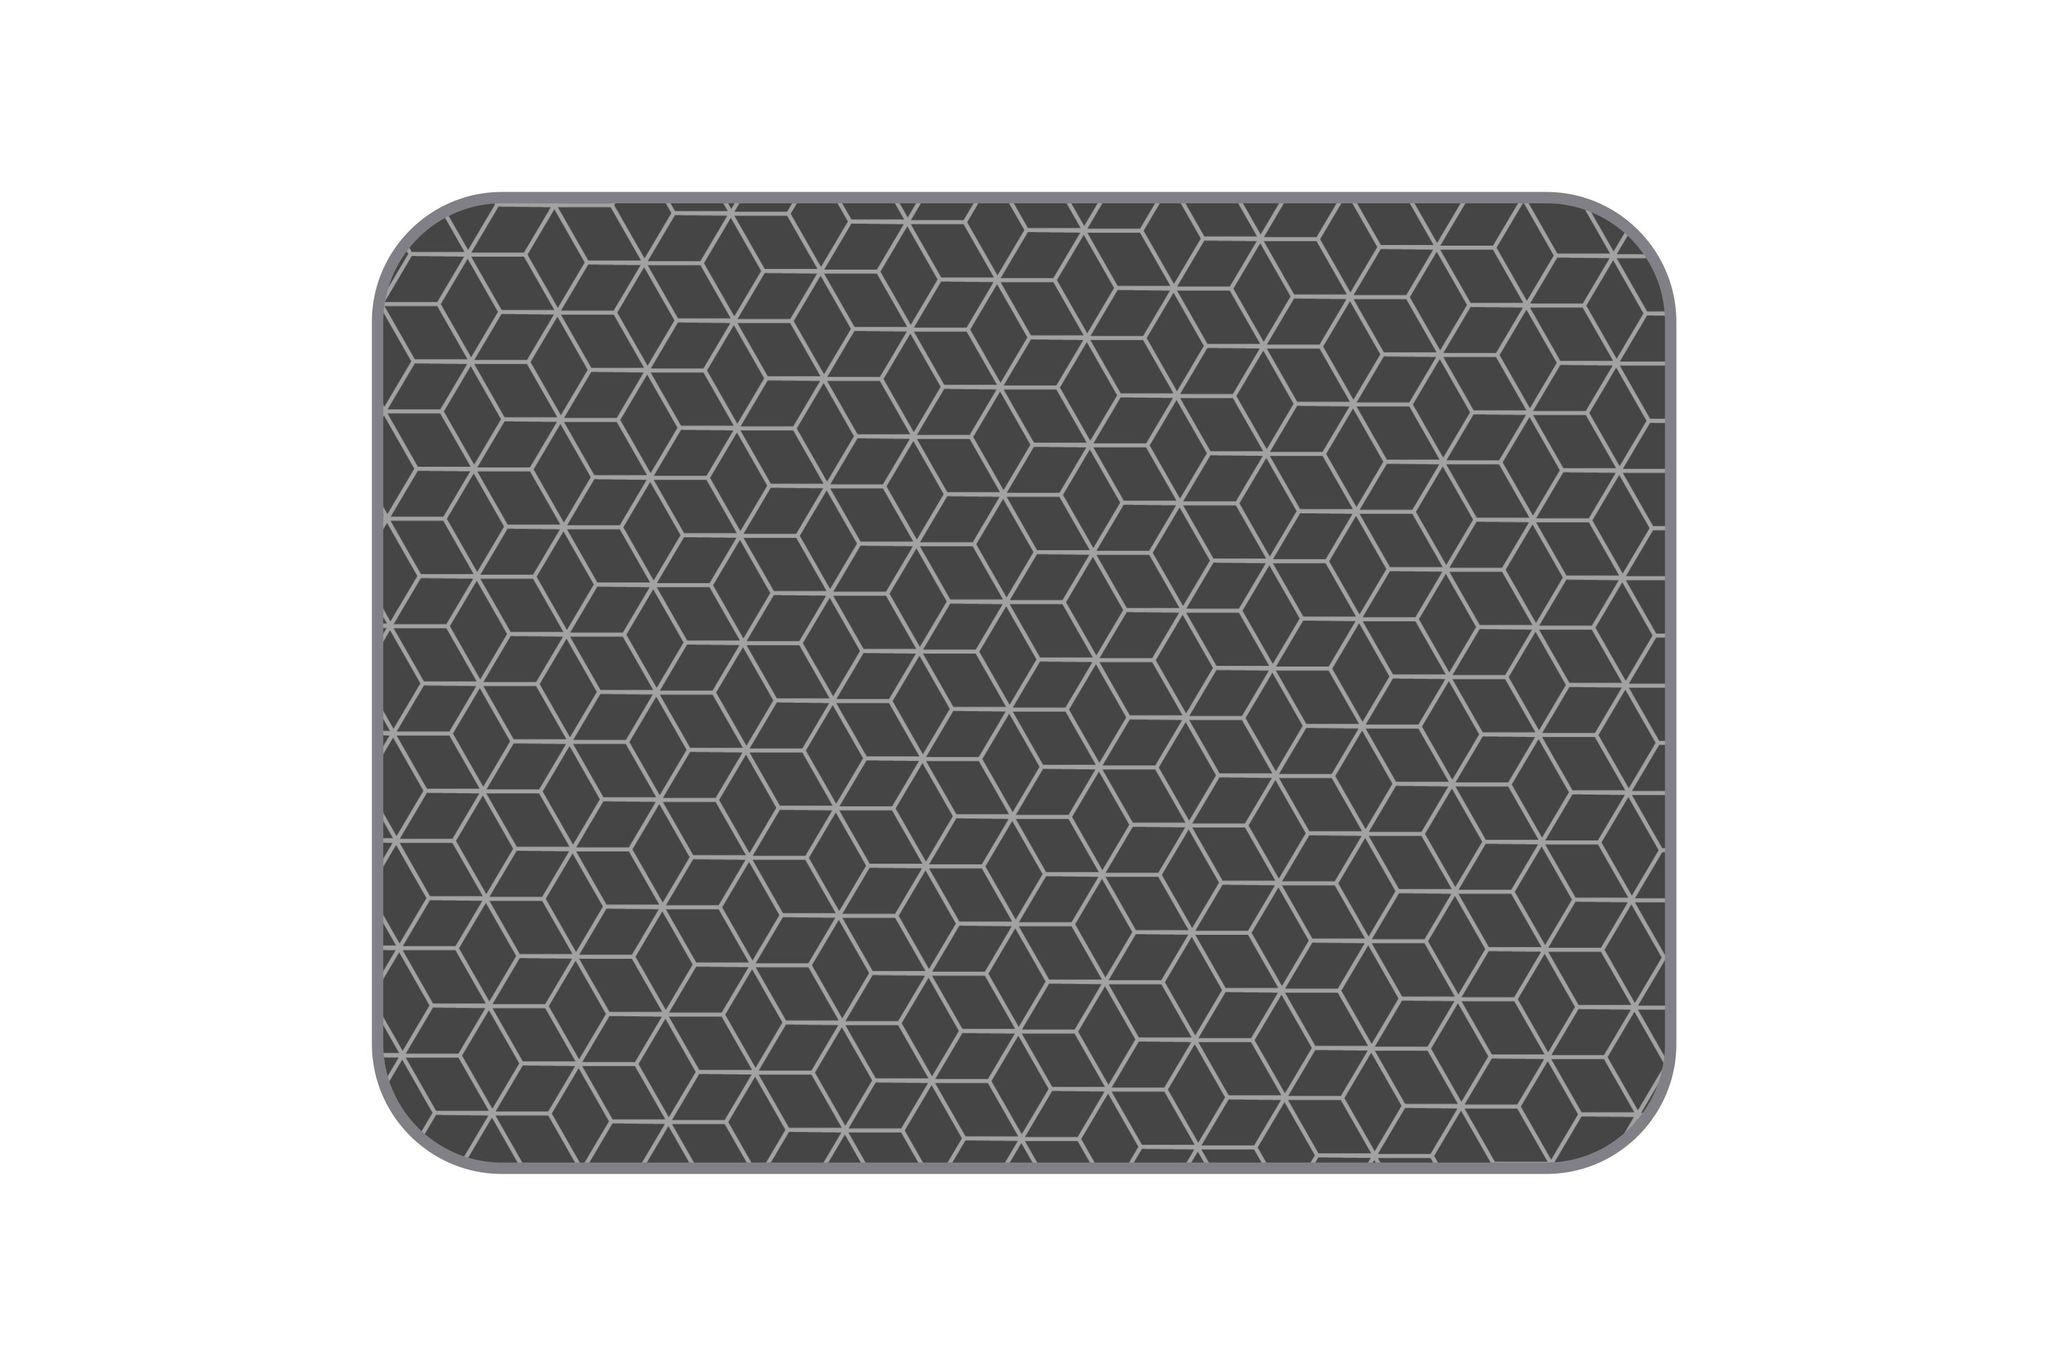 Плюшевый коврик Tetrix 120х160 см